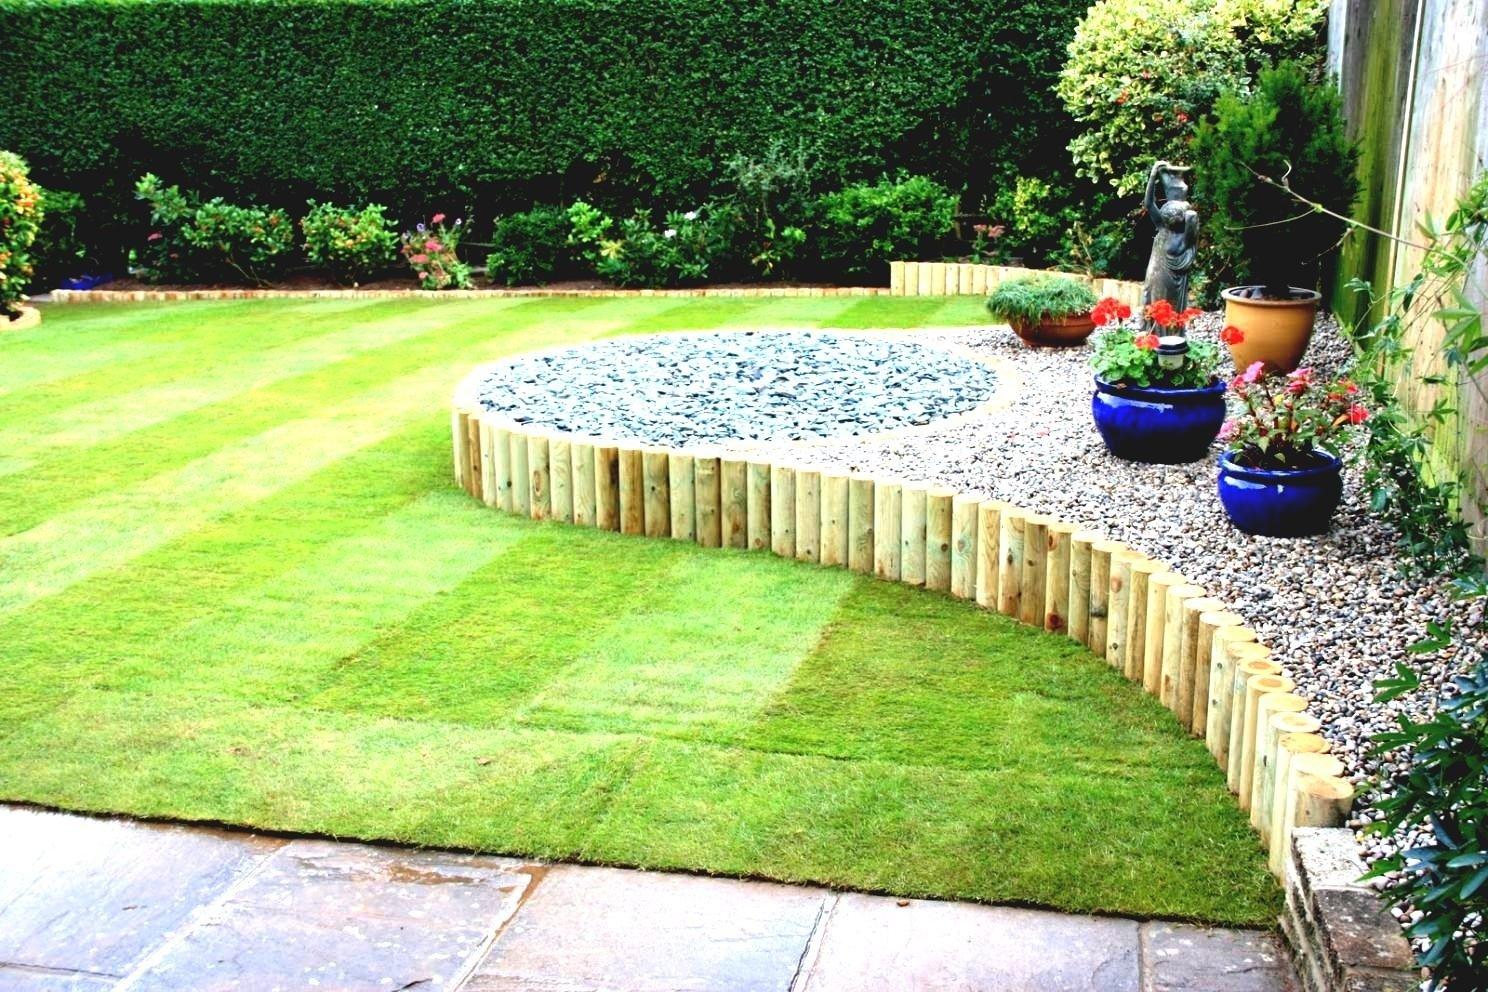 10 Stylish Simple Front Yard Landscaping Ideas On A Budget landscaping ideas pictures simple front yard design decors 1